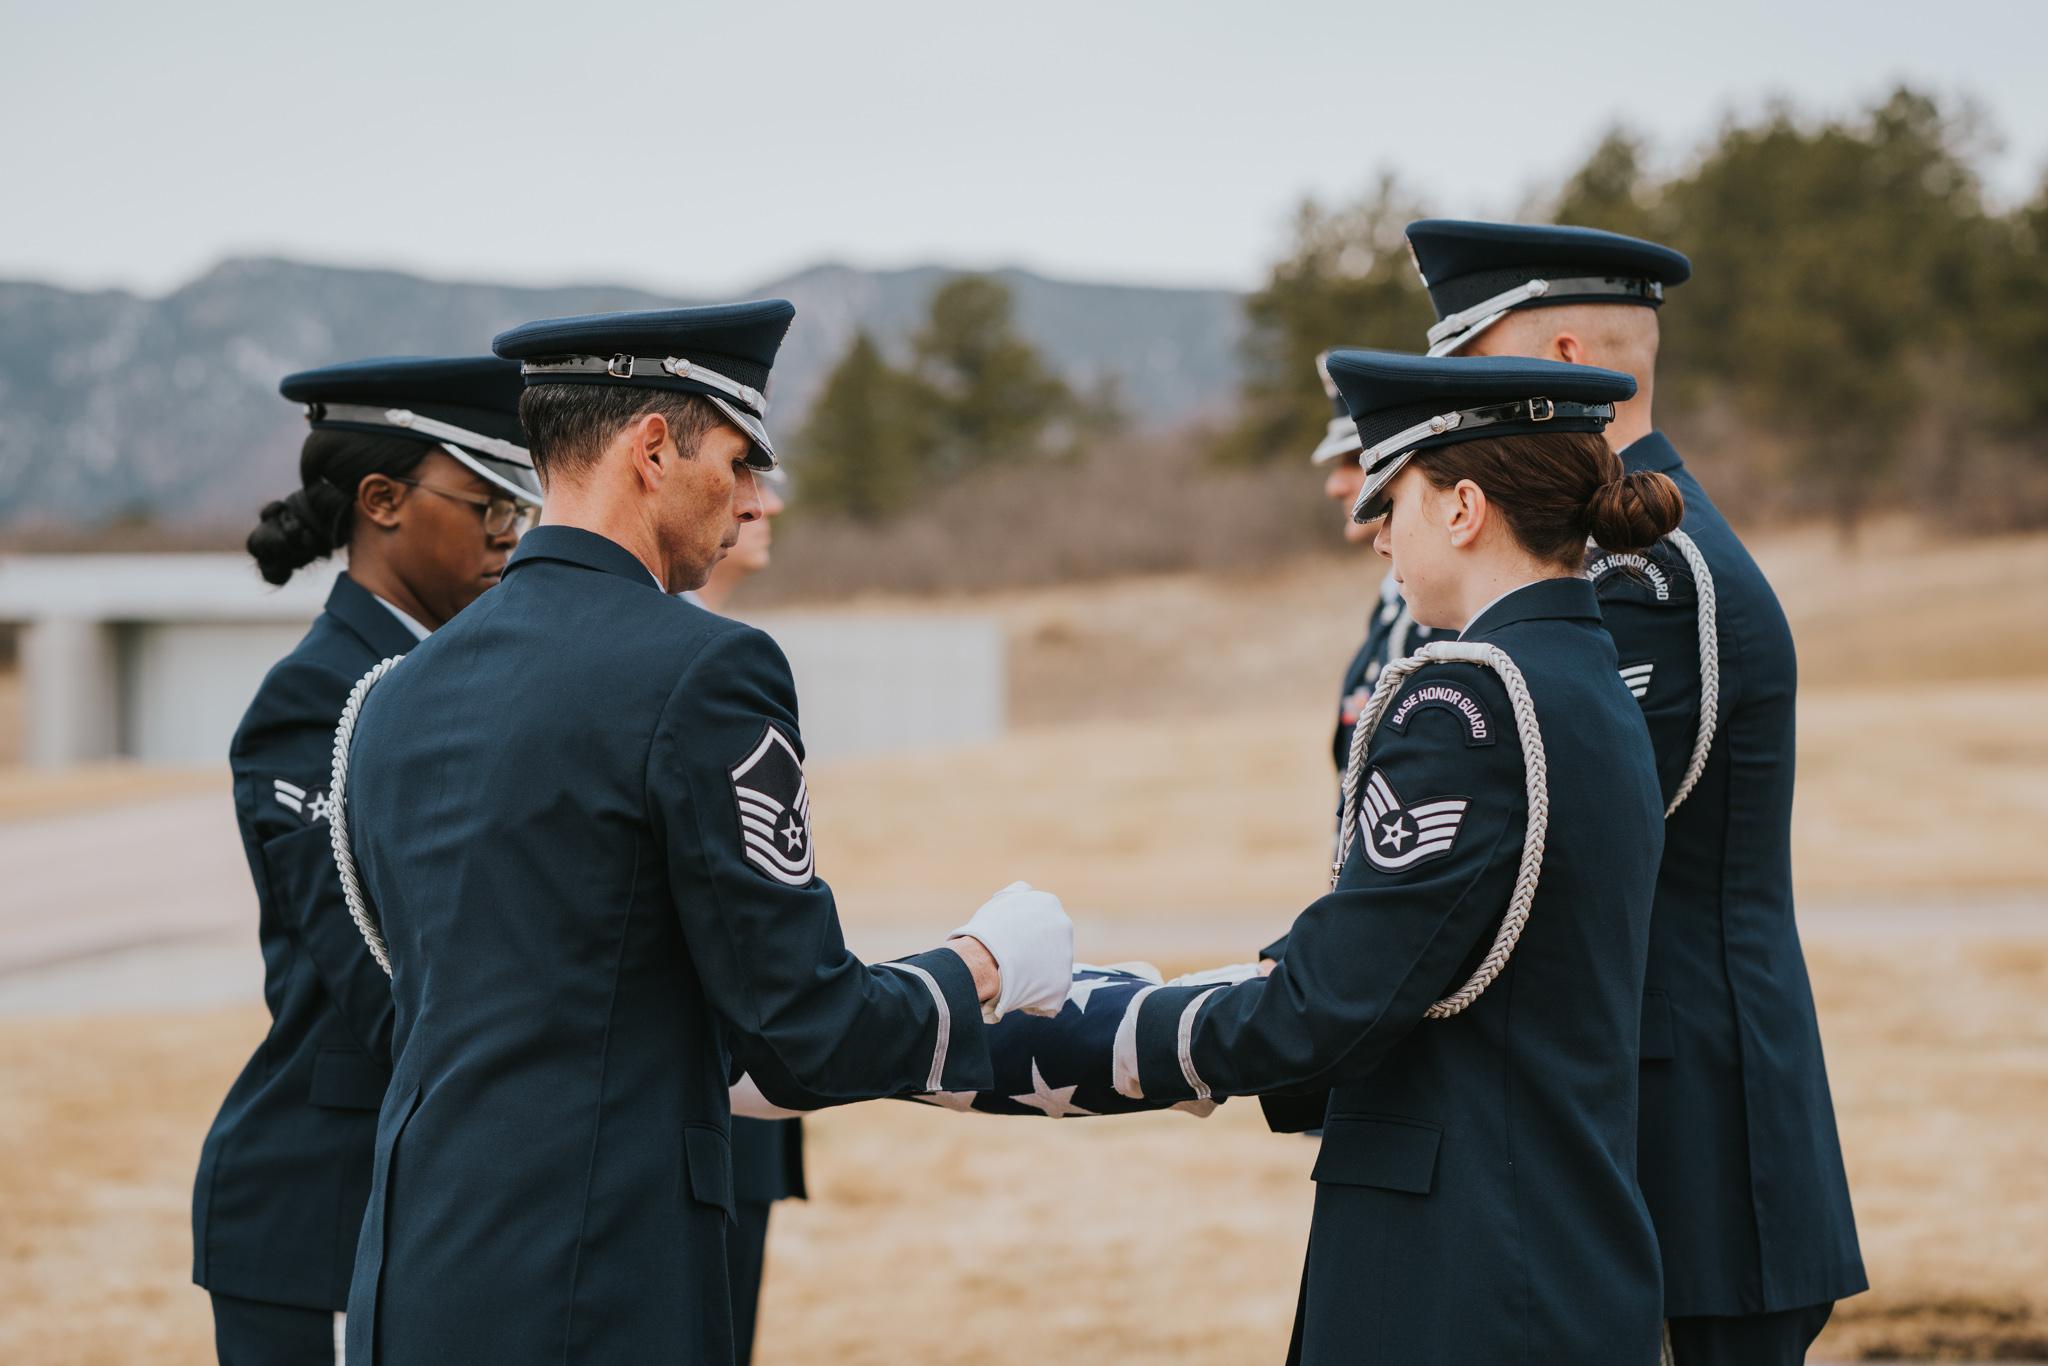 usafa-colorado-military-honours-burial-funeral-photography-grace-elizabeth-colchester-essex-alternative-wedding-lifestyle-photographer (60 of 127).jpg